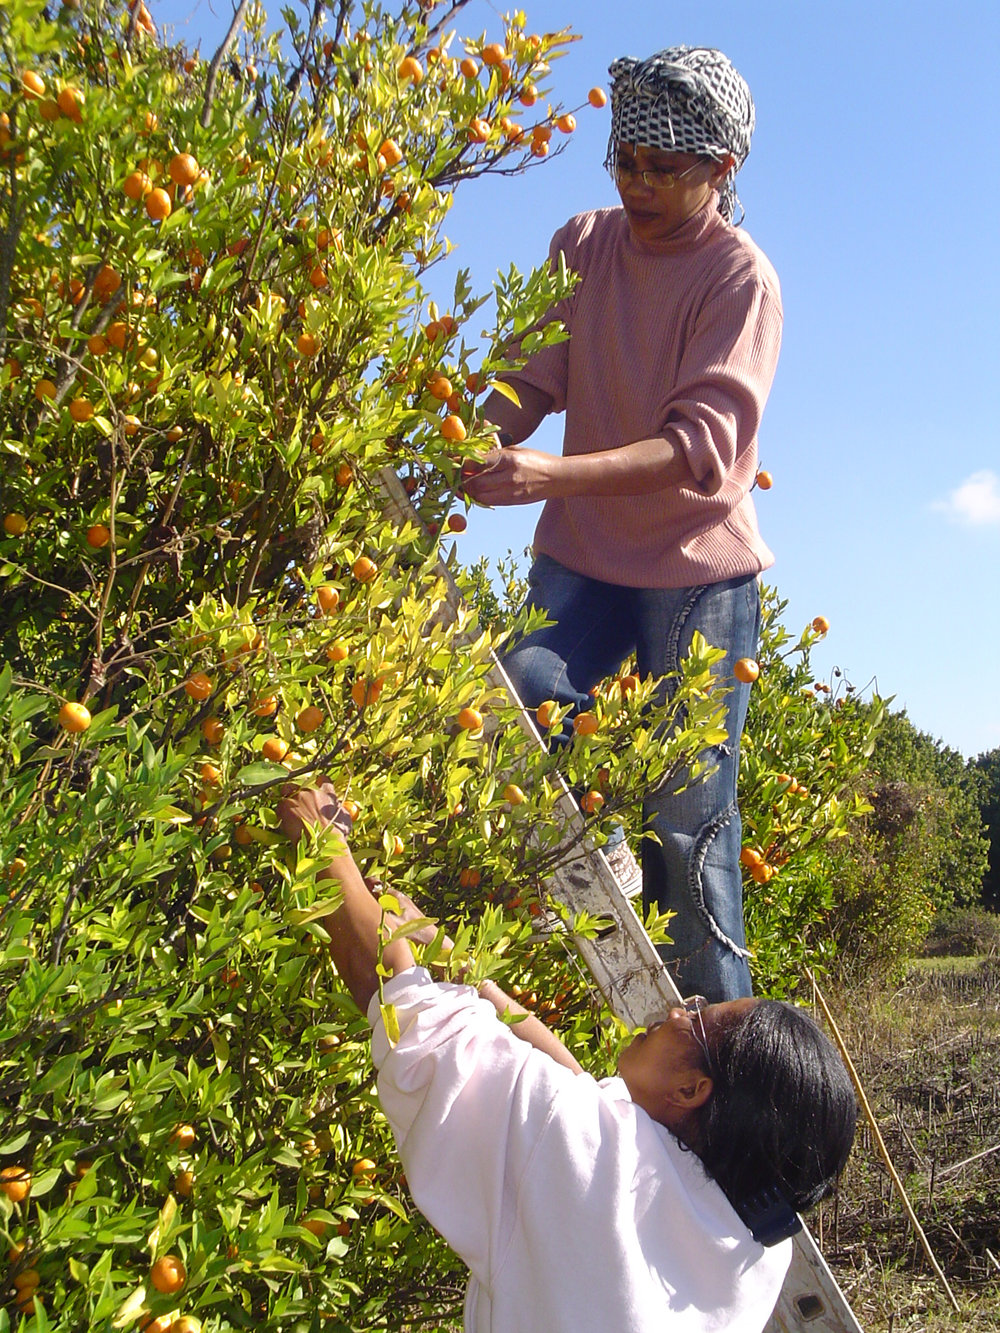 cf1aa-2-Ramassage-des-Mandarines-sauvages.jpg